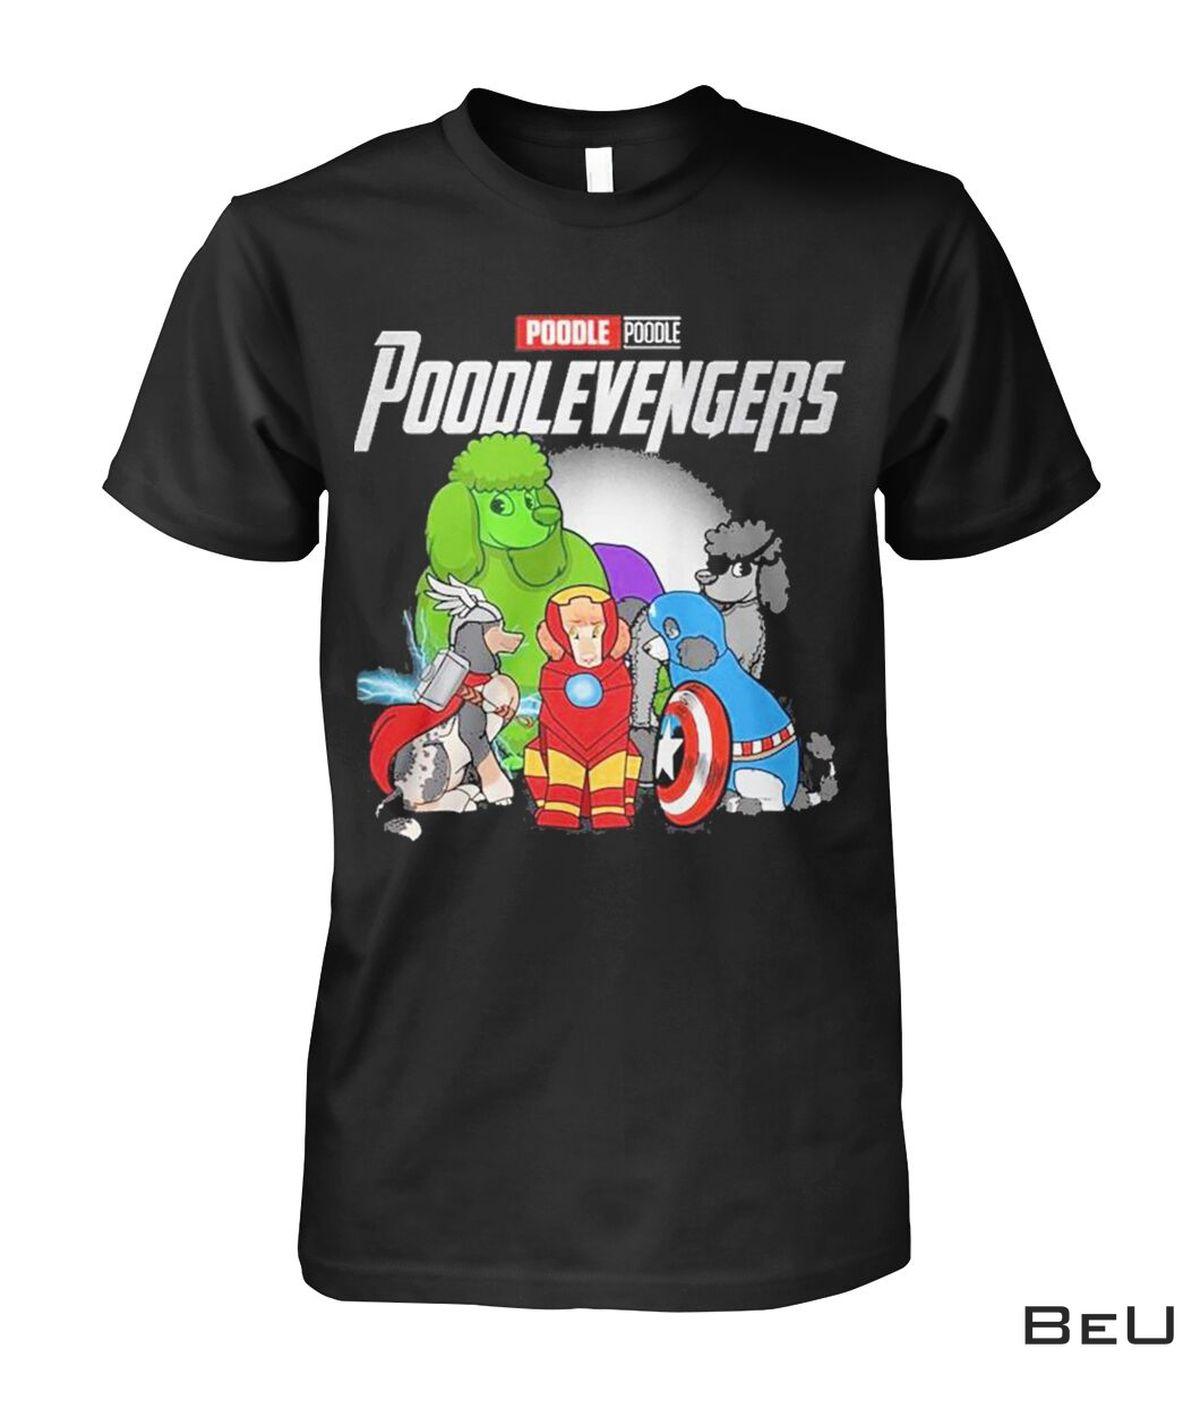 Poodle Poodlevengers Avengers Shirt